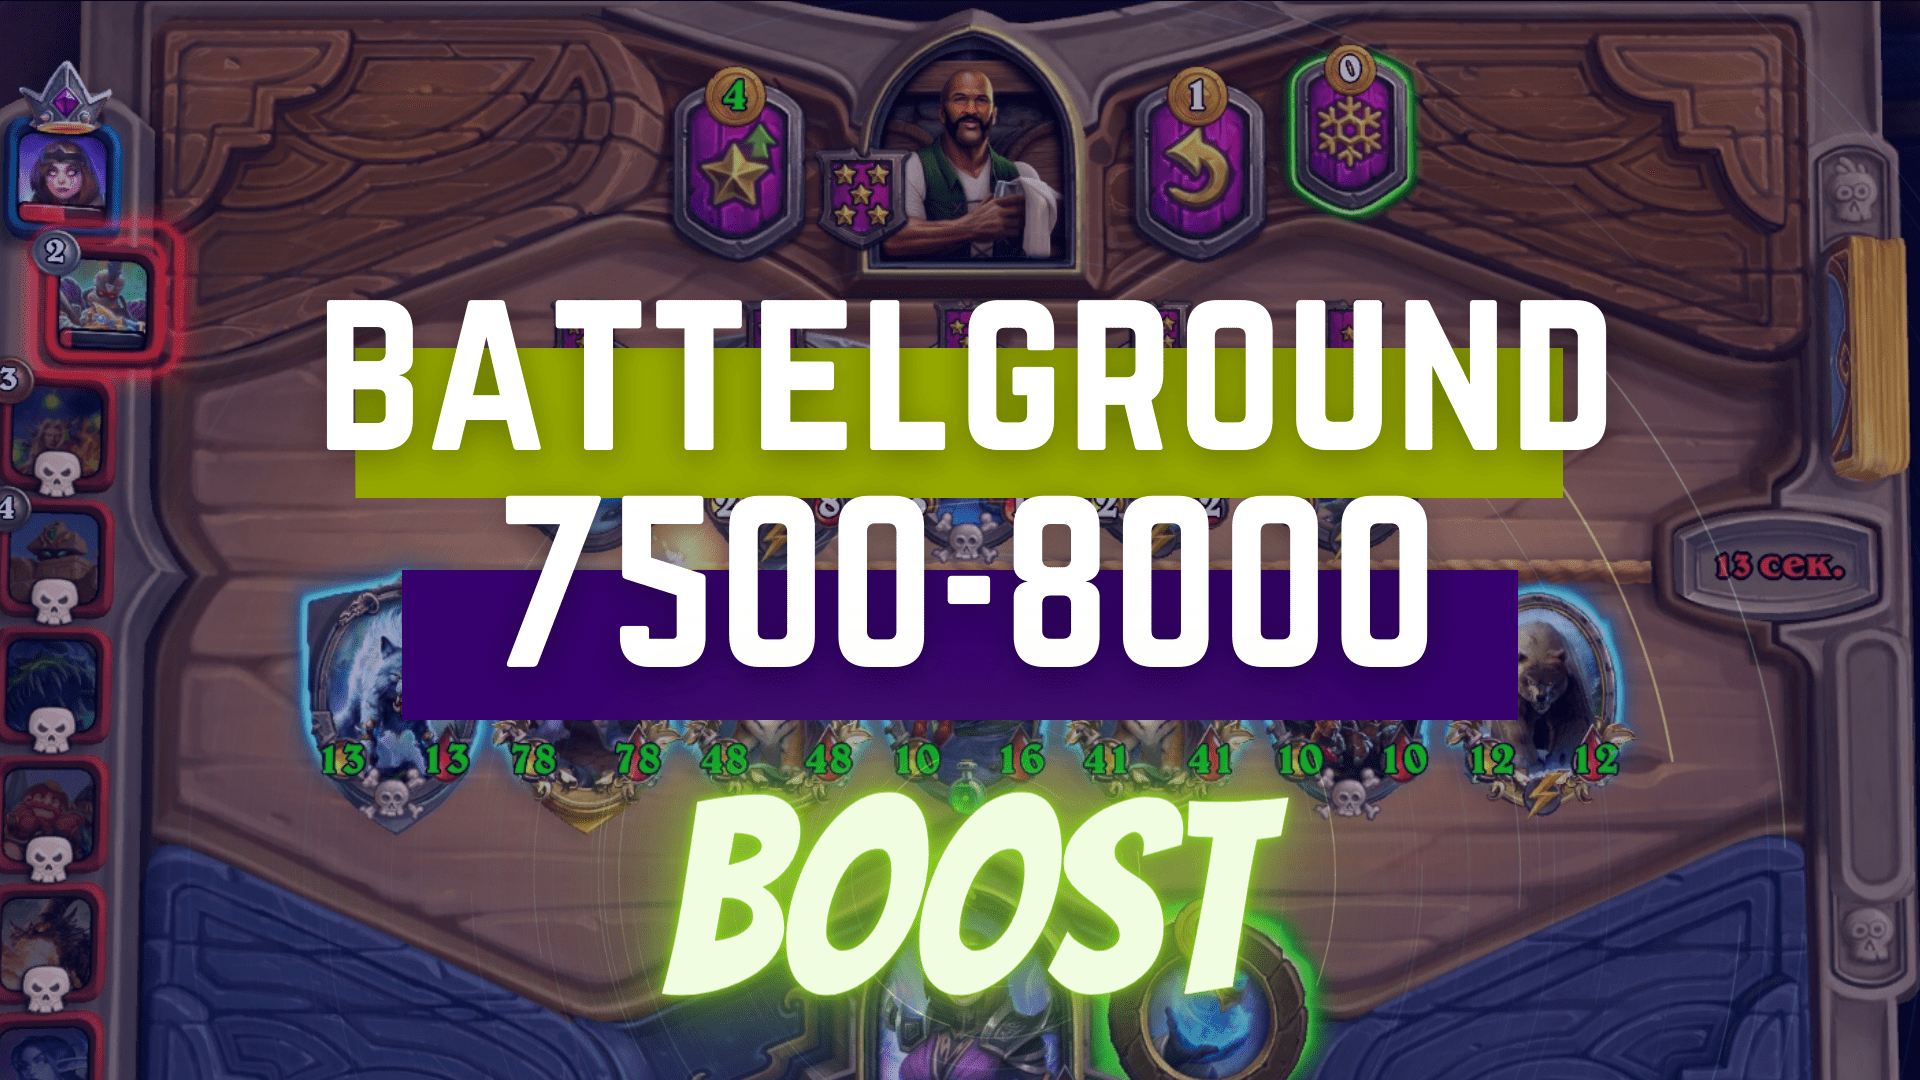 [BATTLEGROUNDS RATING] BOOST FROM 7500 TO 8000 Zafari - e2p.com